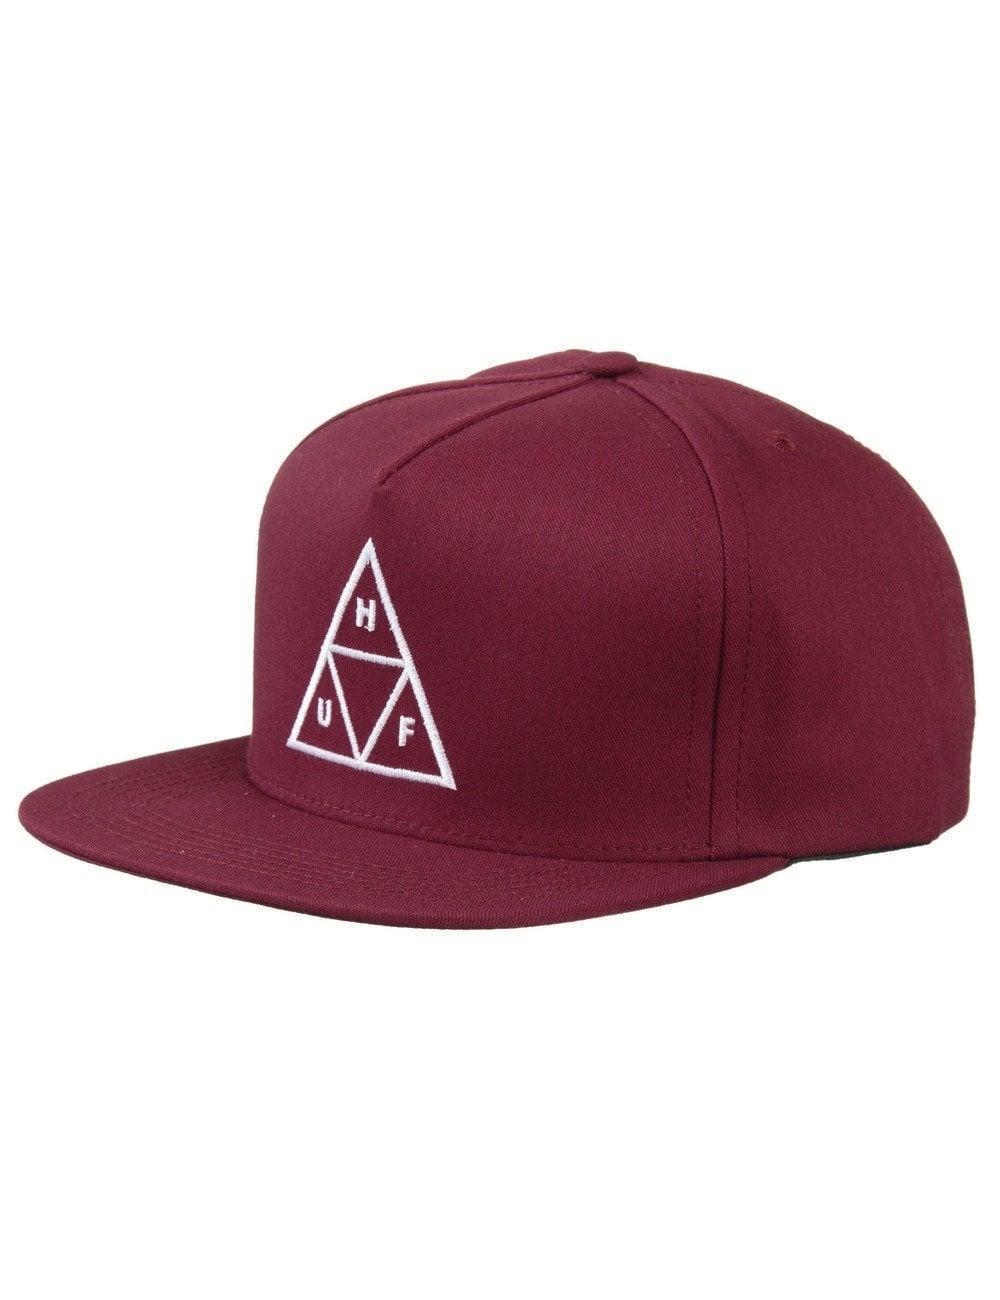 56d2e5cca8c Huf Triple Triangle Snapback Hat - Wine - Accessories from Fat ...